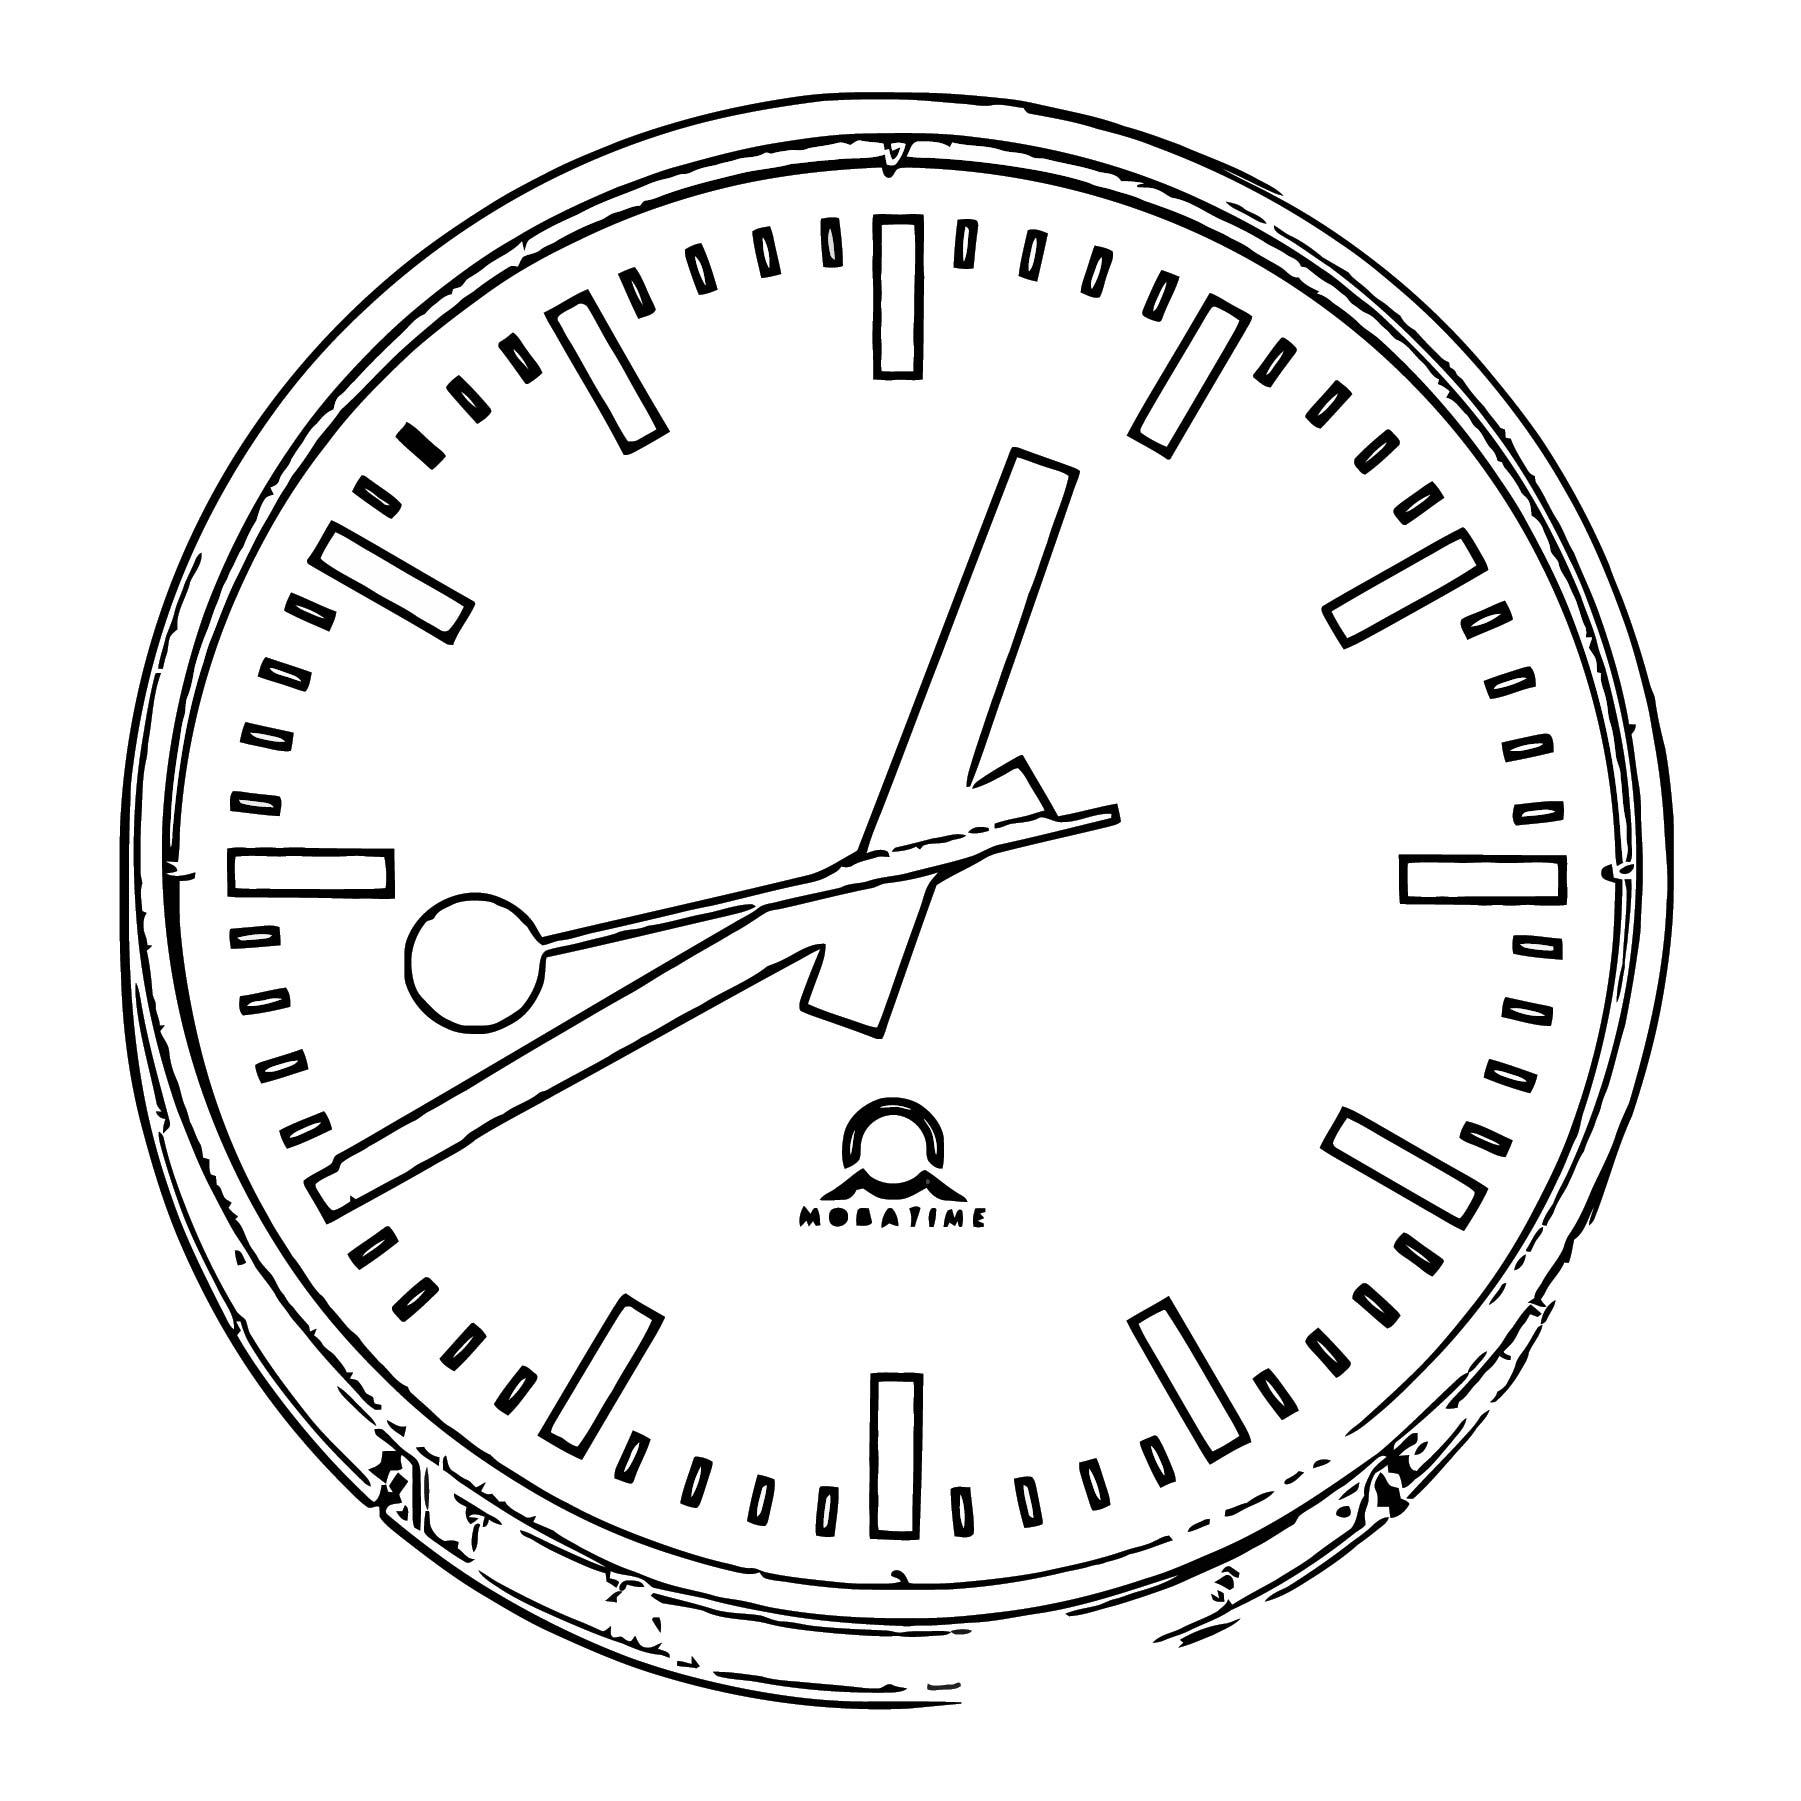 Bahnhofsuhrzuerich Free Printable Rz Cartoonized Free Printable Coloring Page